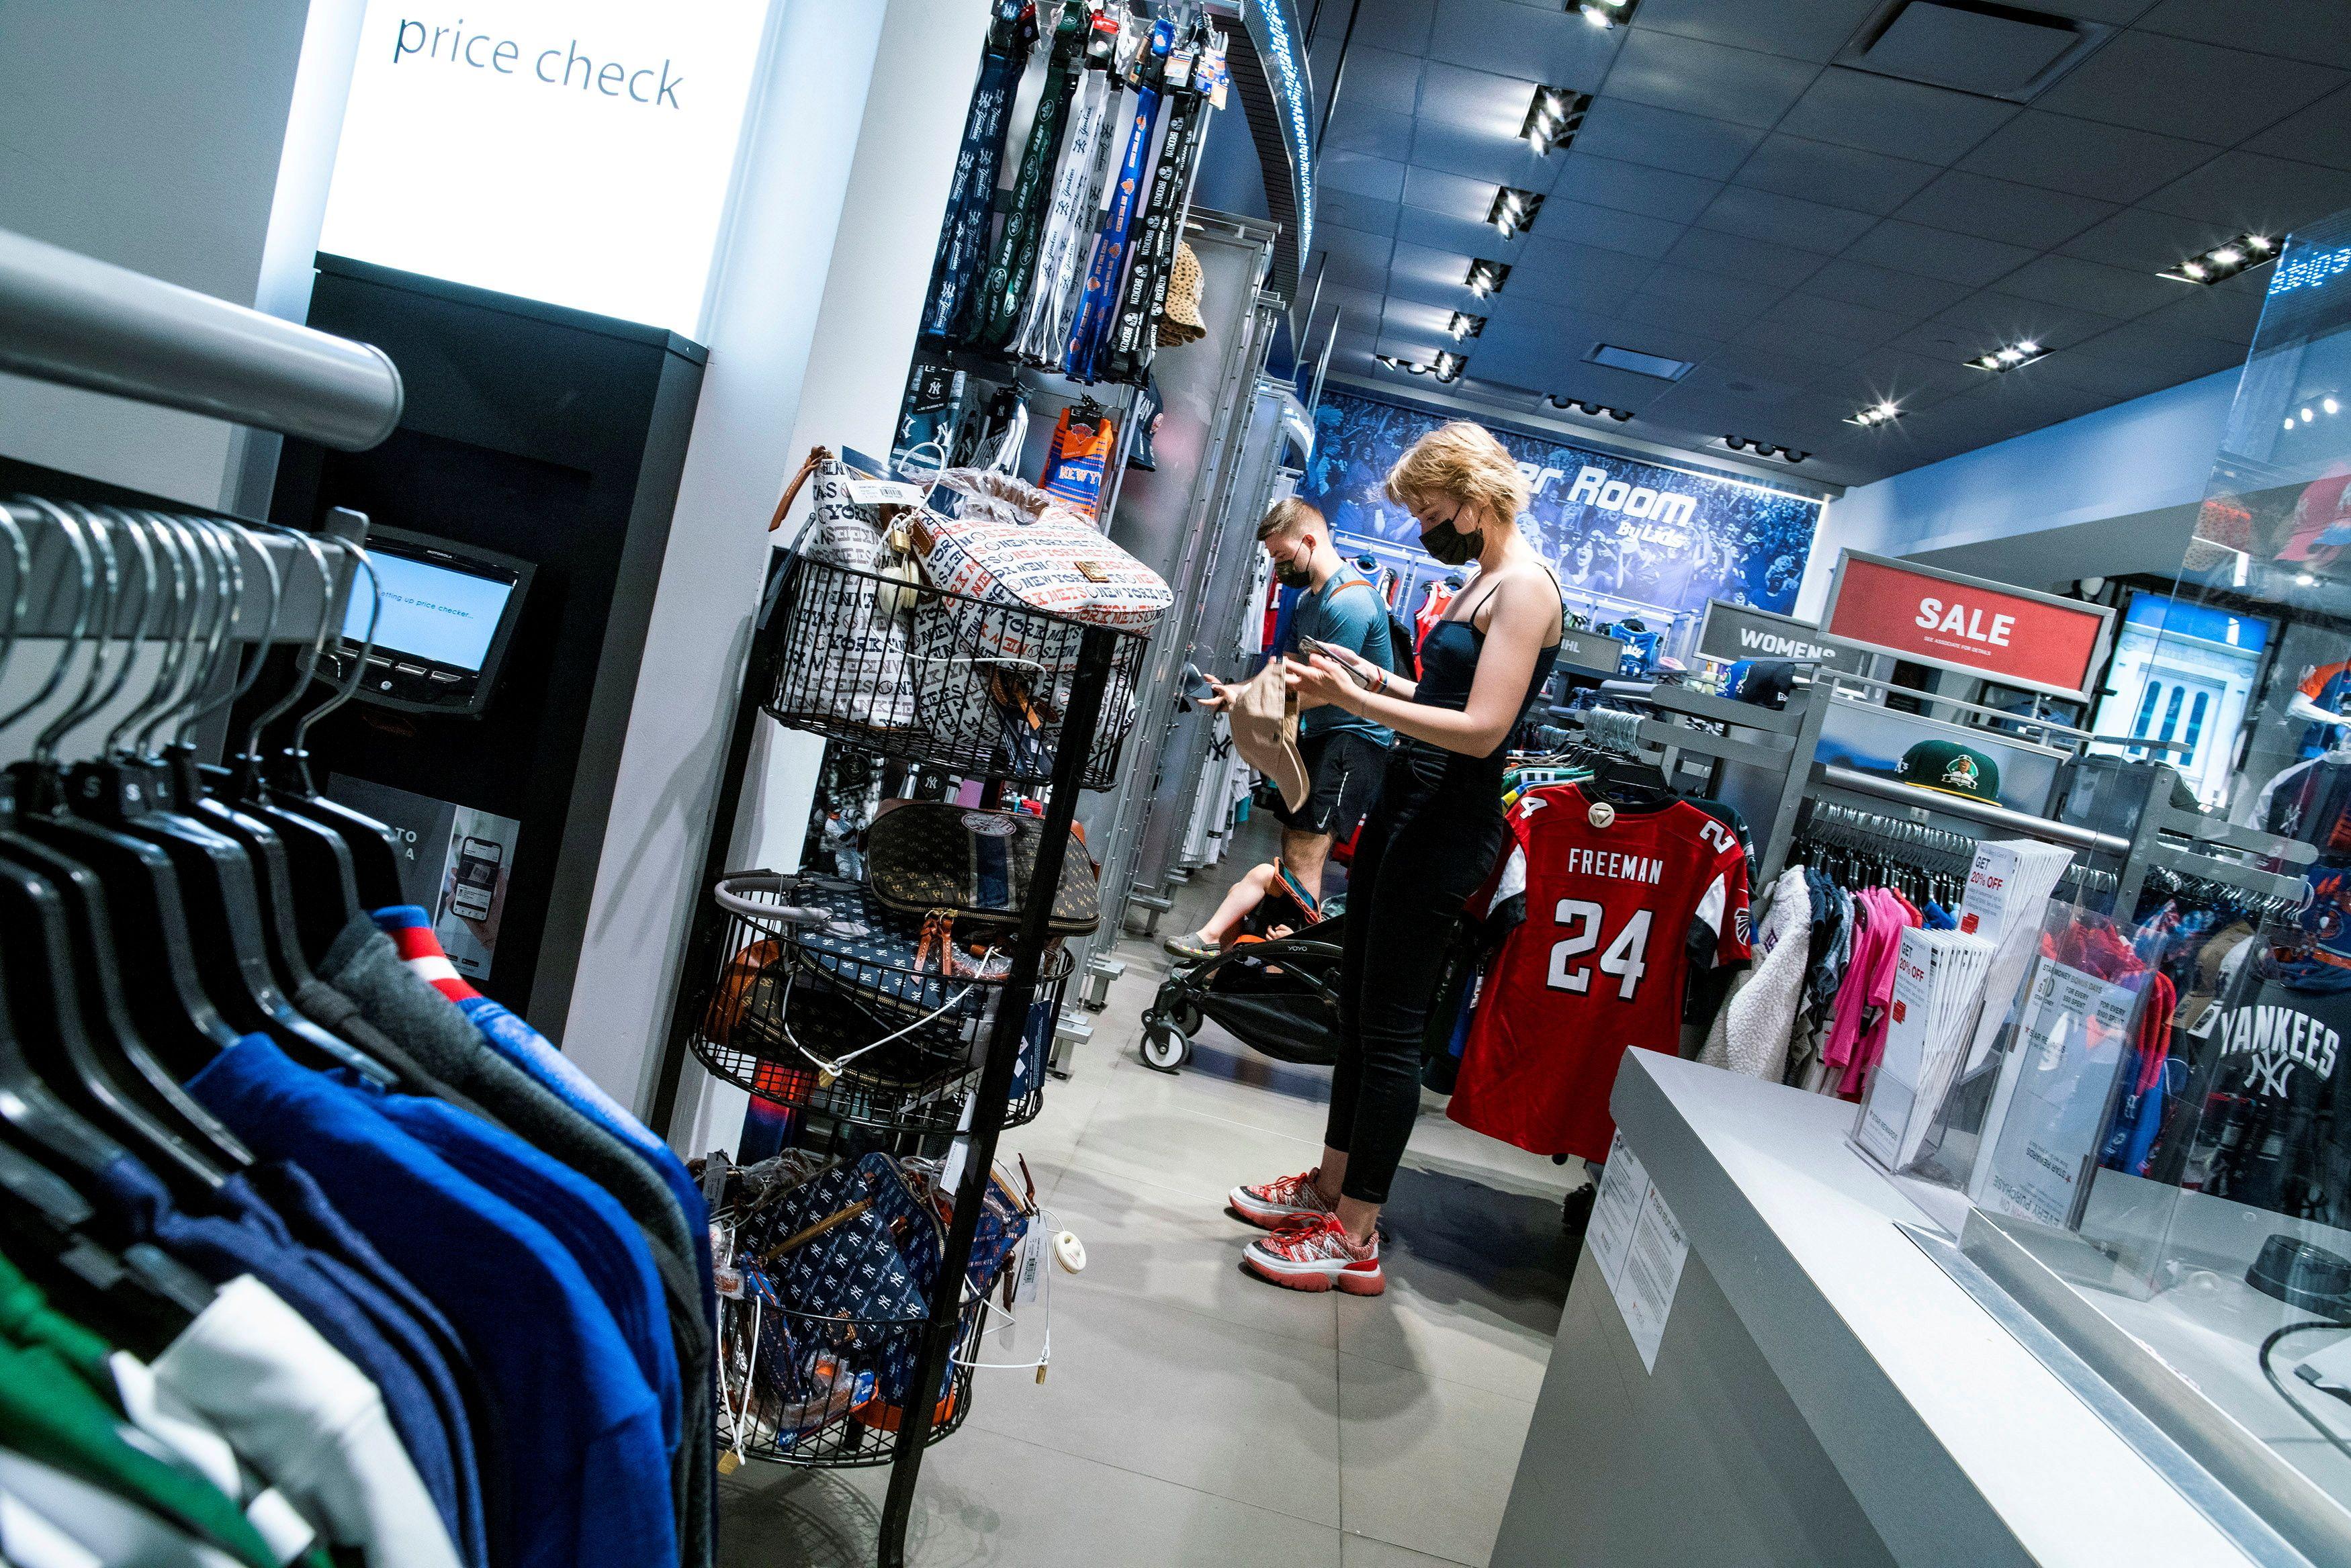 Shoppers visit Macy's flagship store in New York City, New York, U.S., May 20, 2021. REUTERS/Eduardo Munoz/File Photo